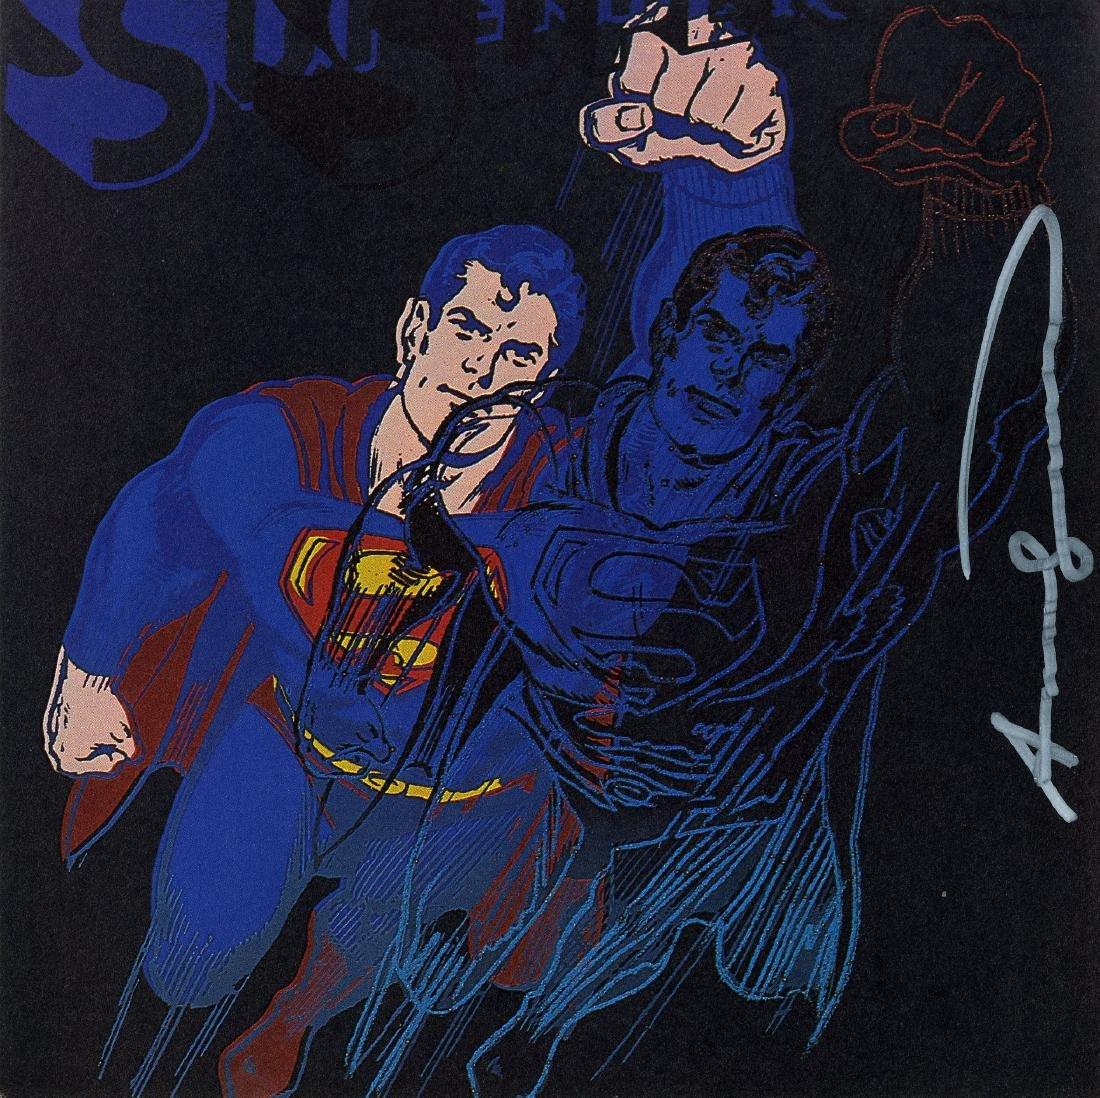 738: ANDY WARHOL - Superman